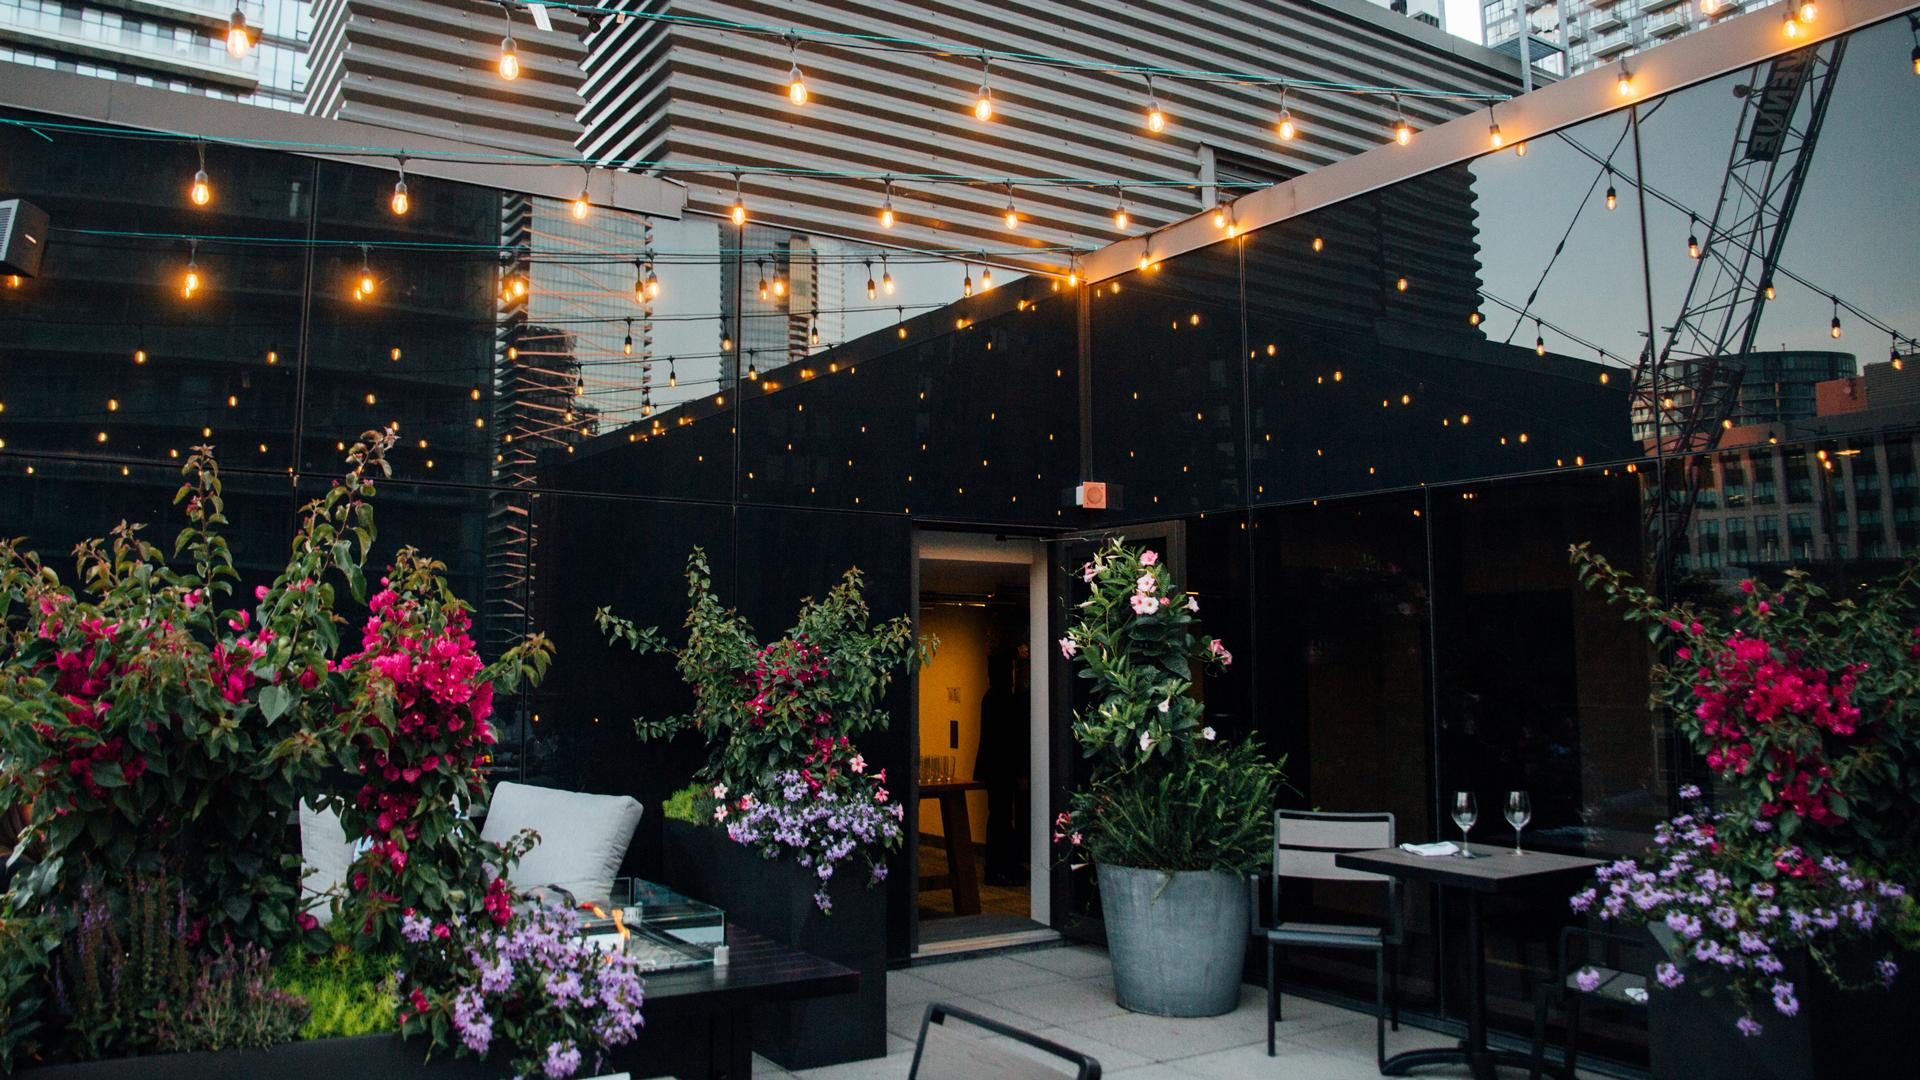 The best rooftop patios in Toronto | Victor Rooftop Terrace